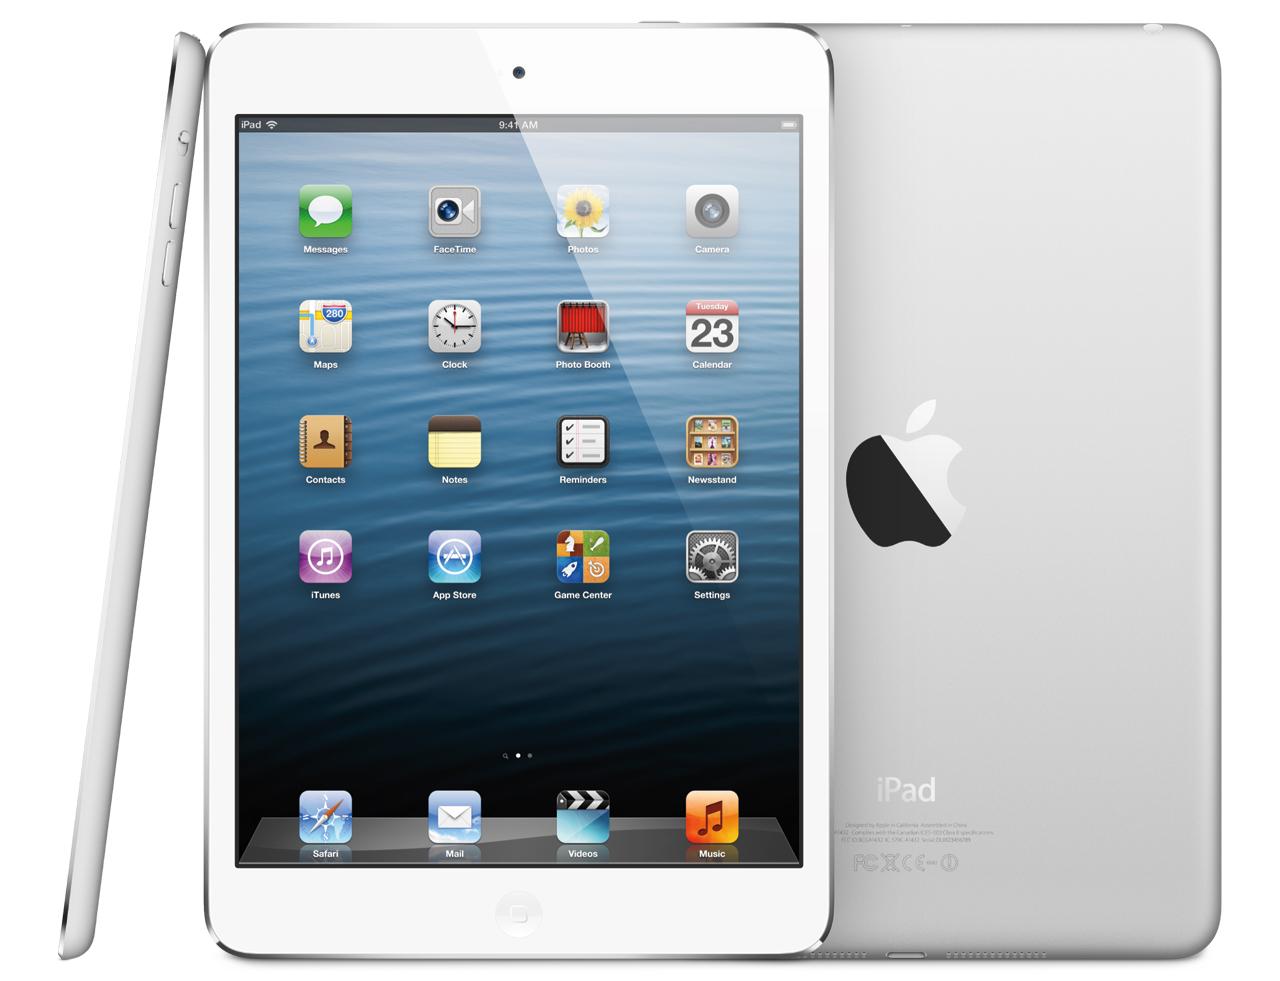 Daftar Harga IPad Apple Terbaru Juli 2013